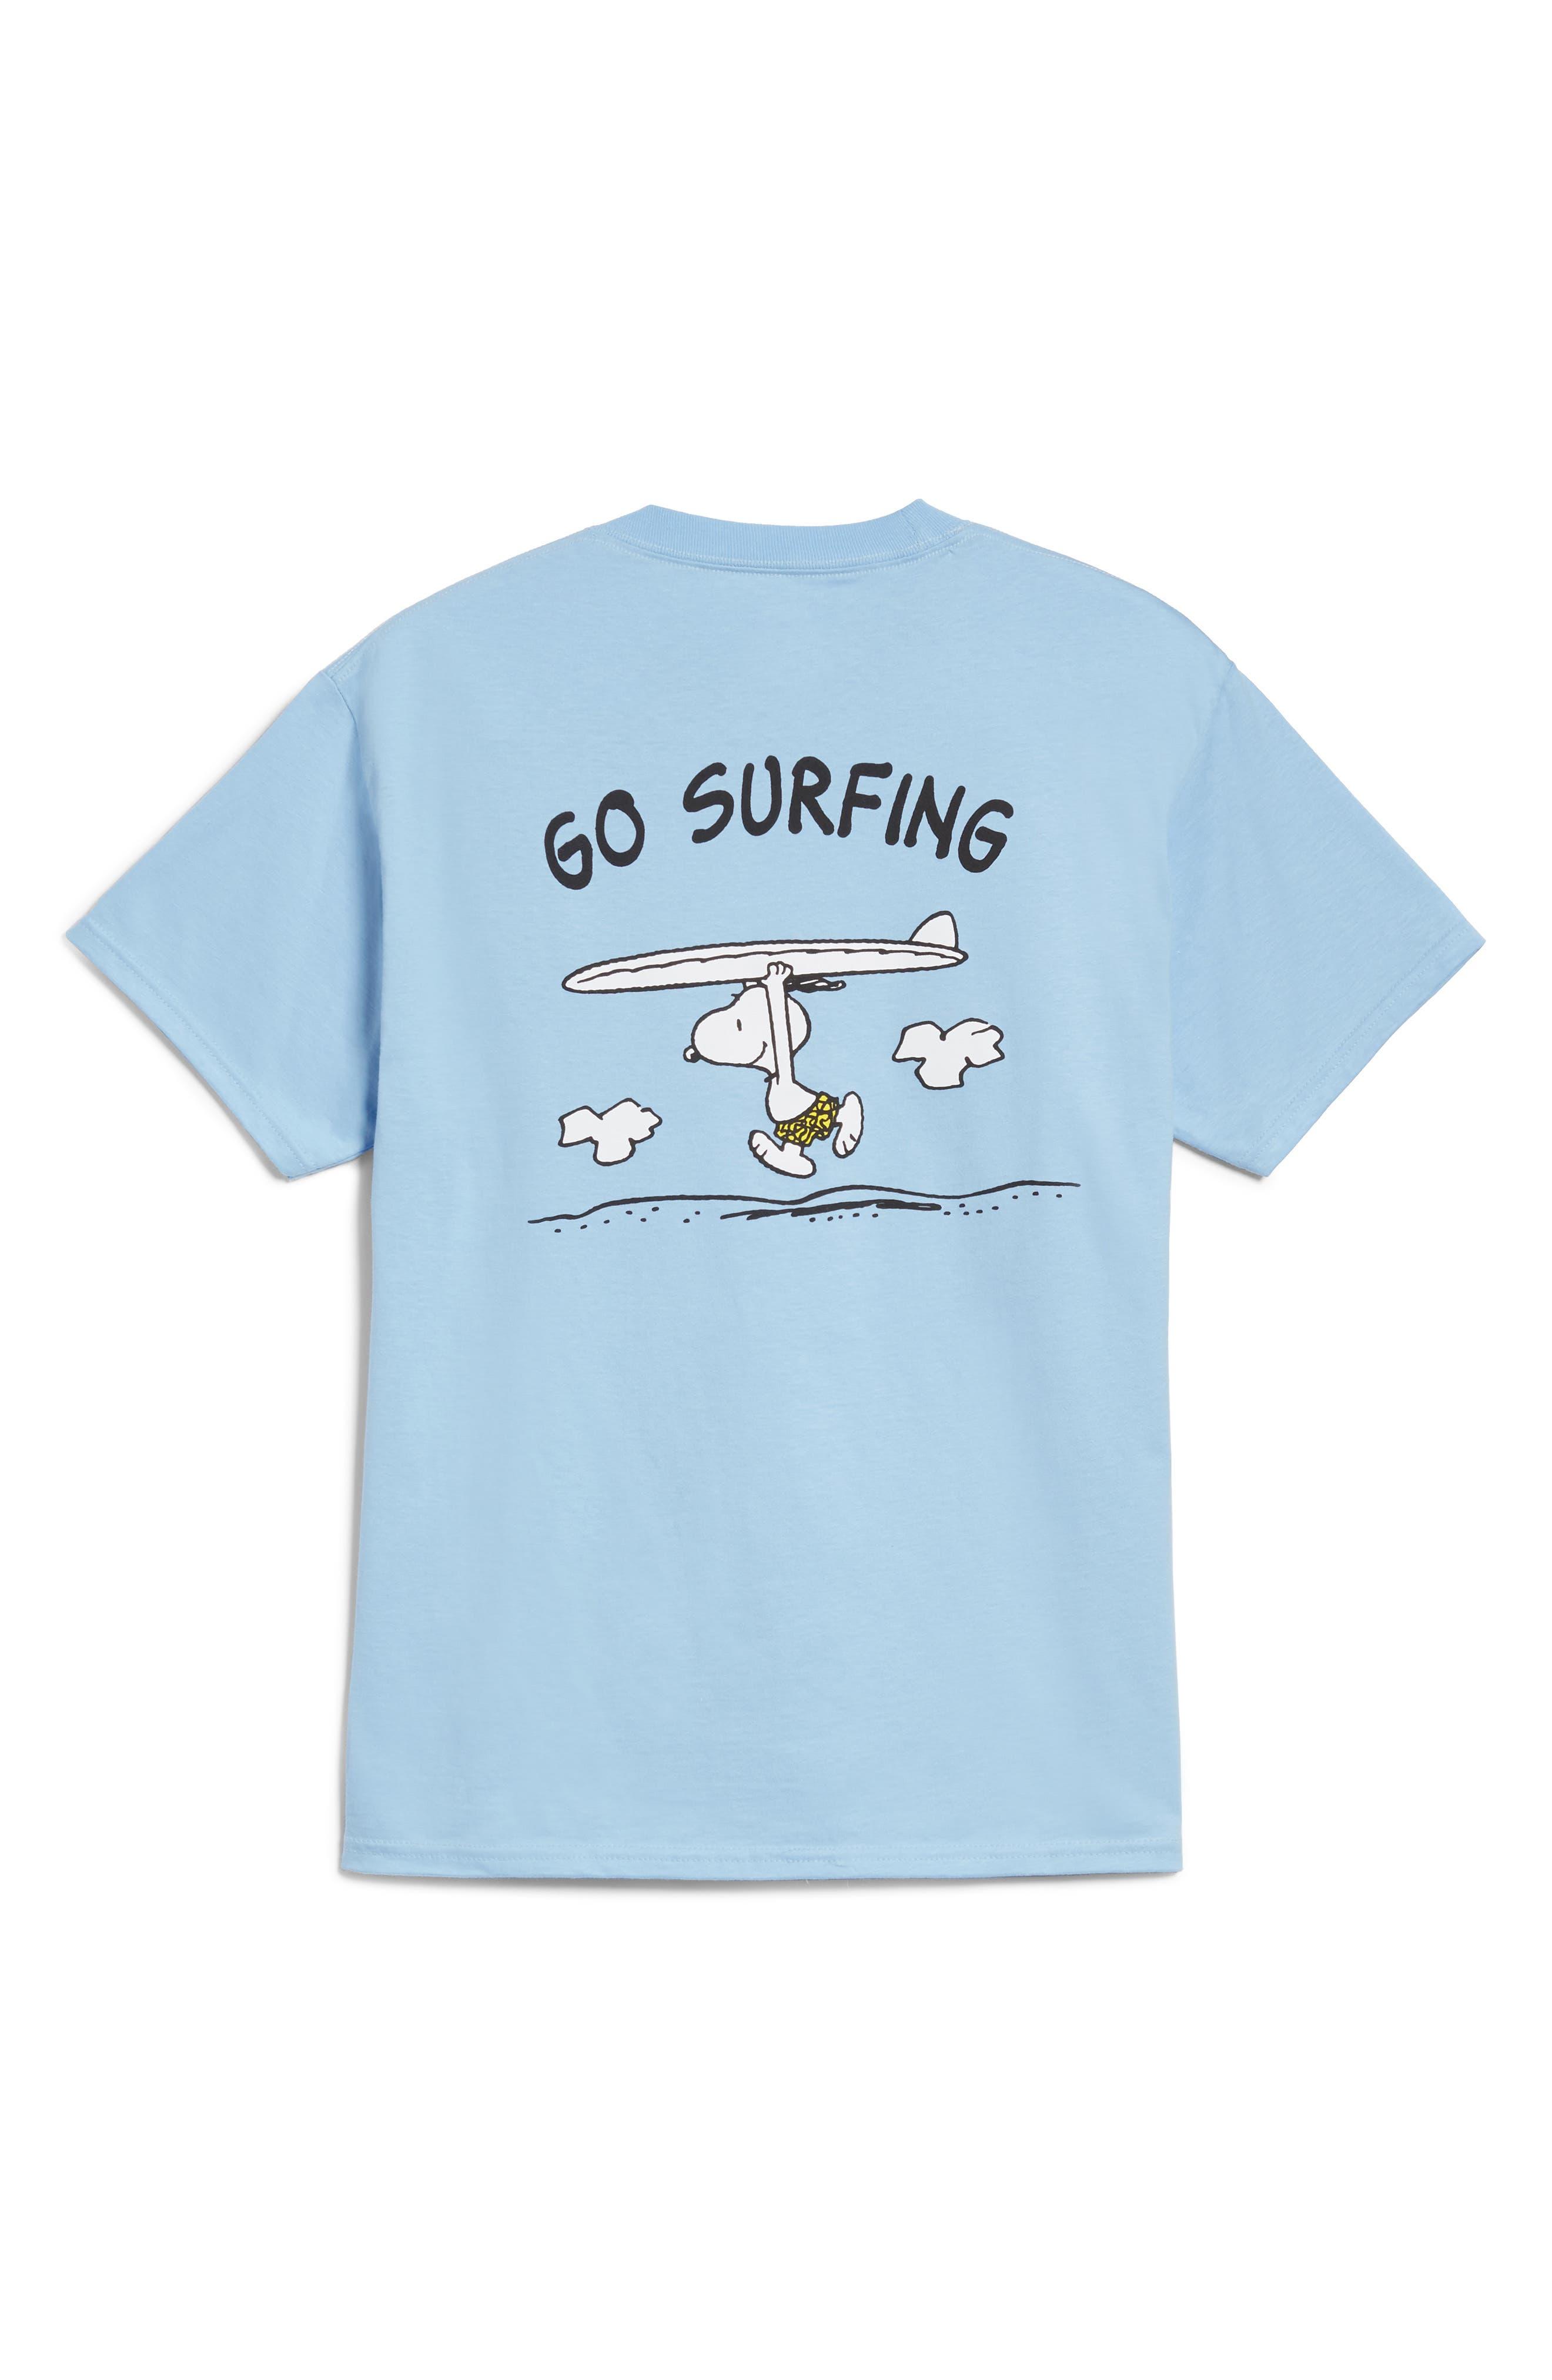 HANES Peanuts Go Surfing T-Shirt